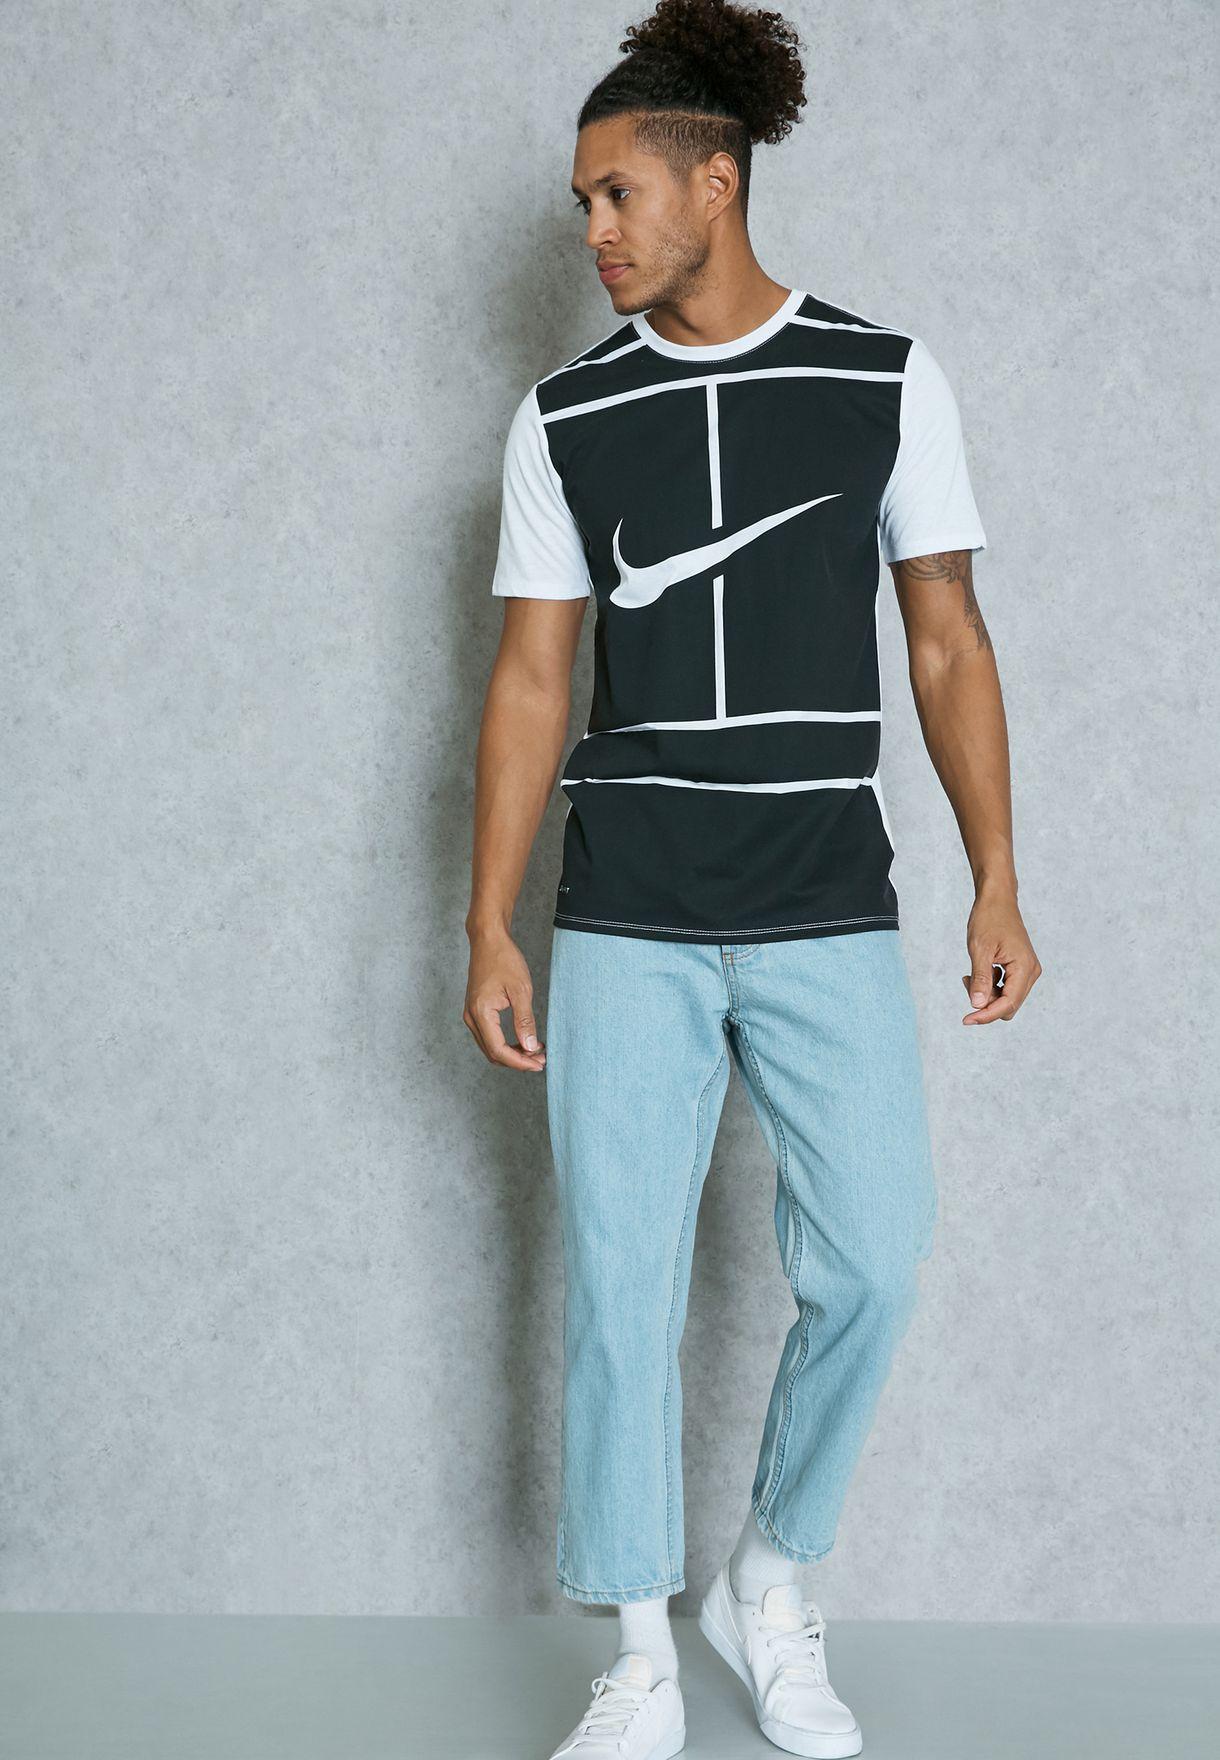 online store 4c4f7 9e61e Dri-FIT Tennis T-Shirt